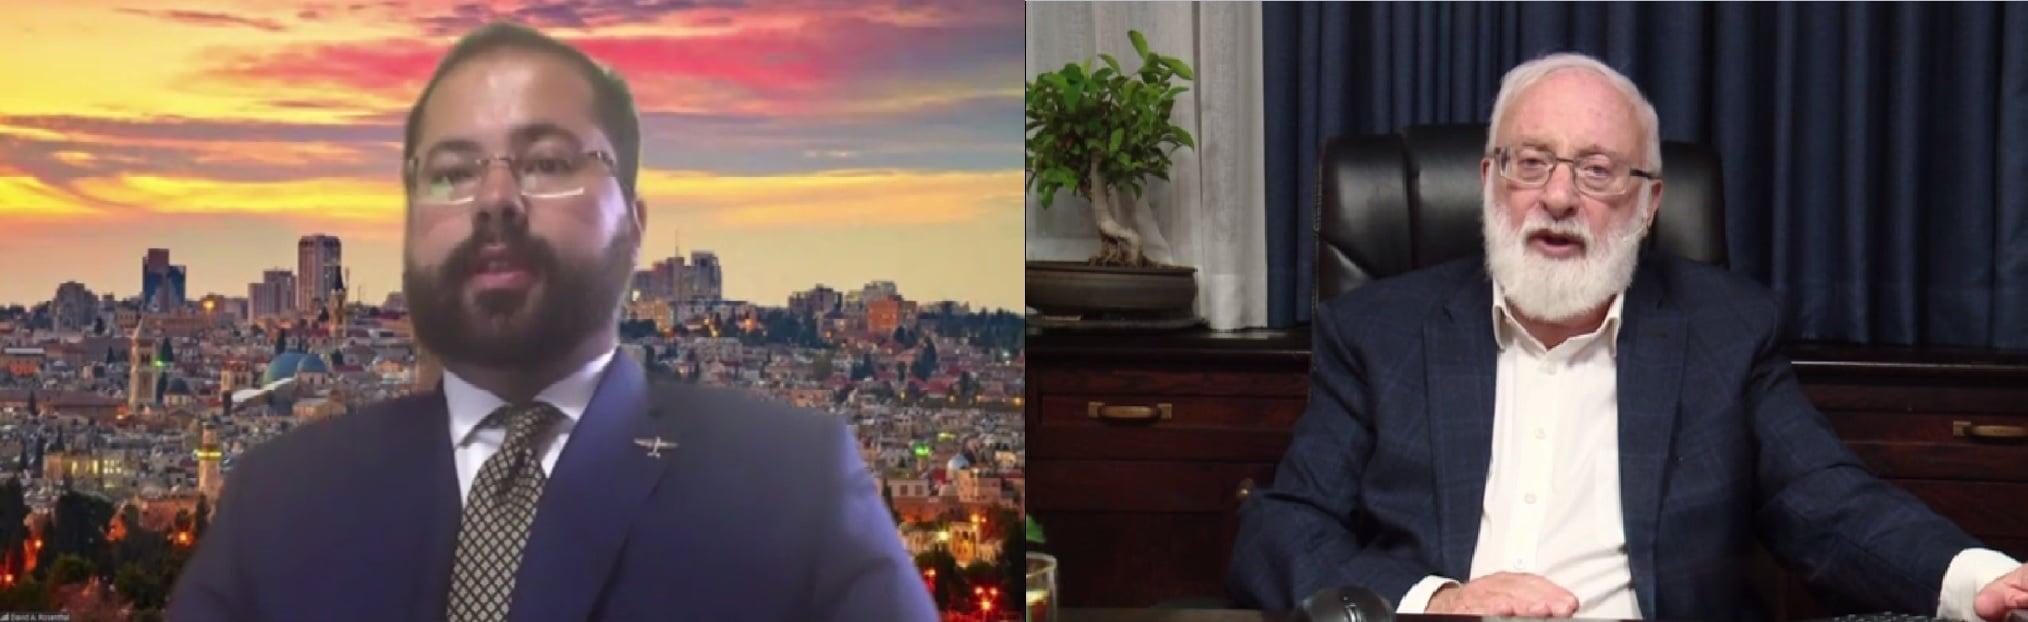 entrevista prensa antisemitismo David A Rosenthal judíos Israel